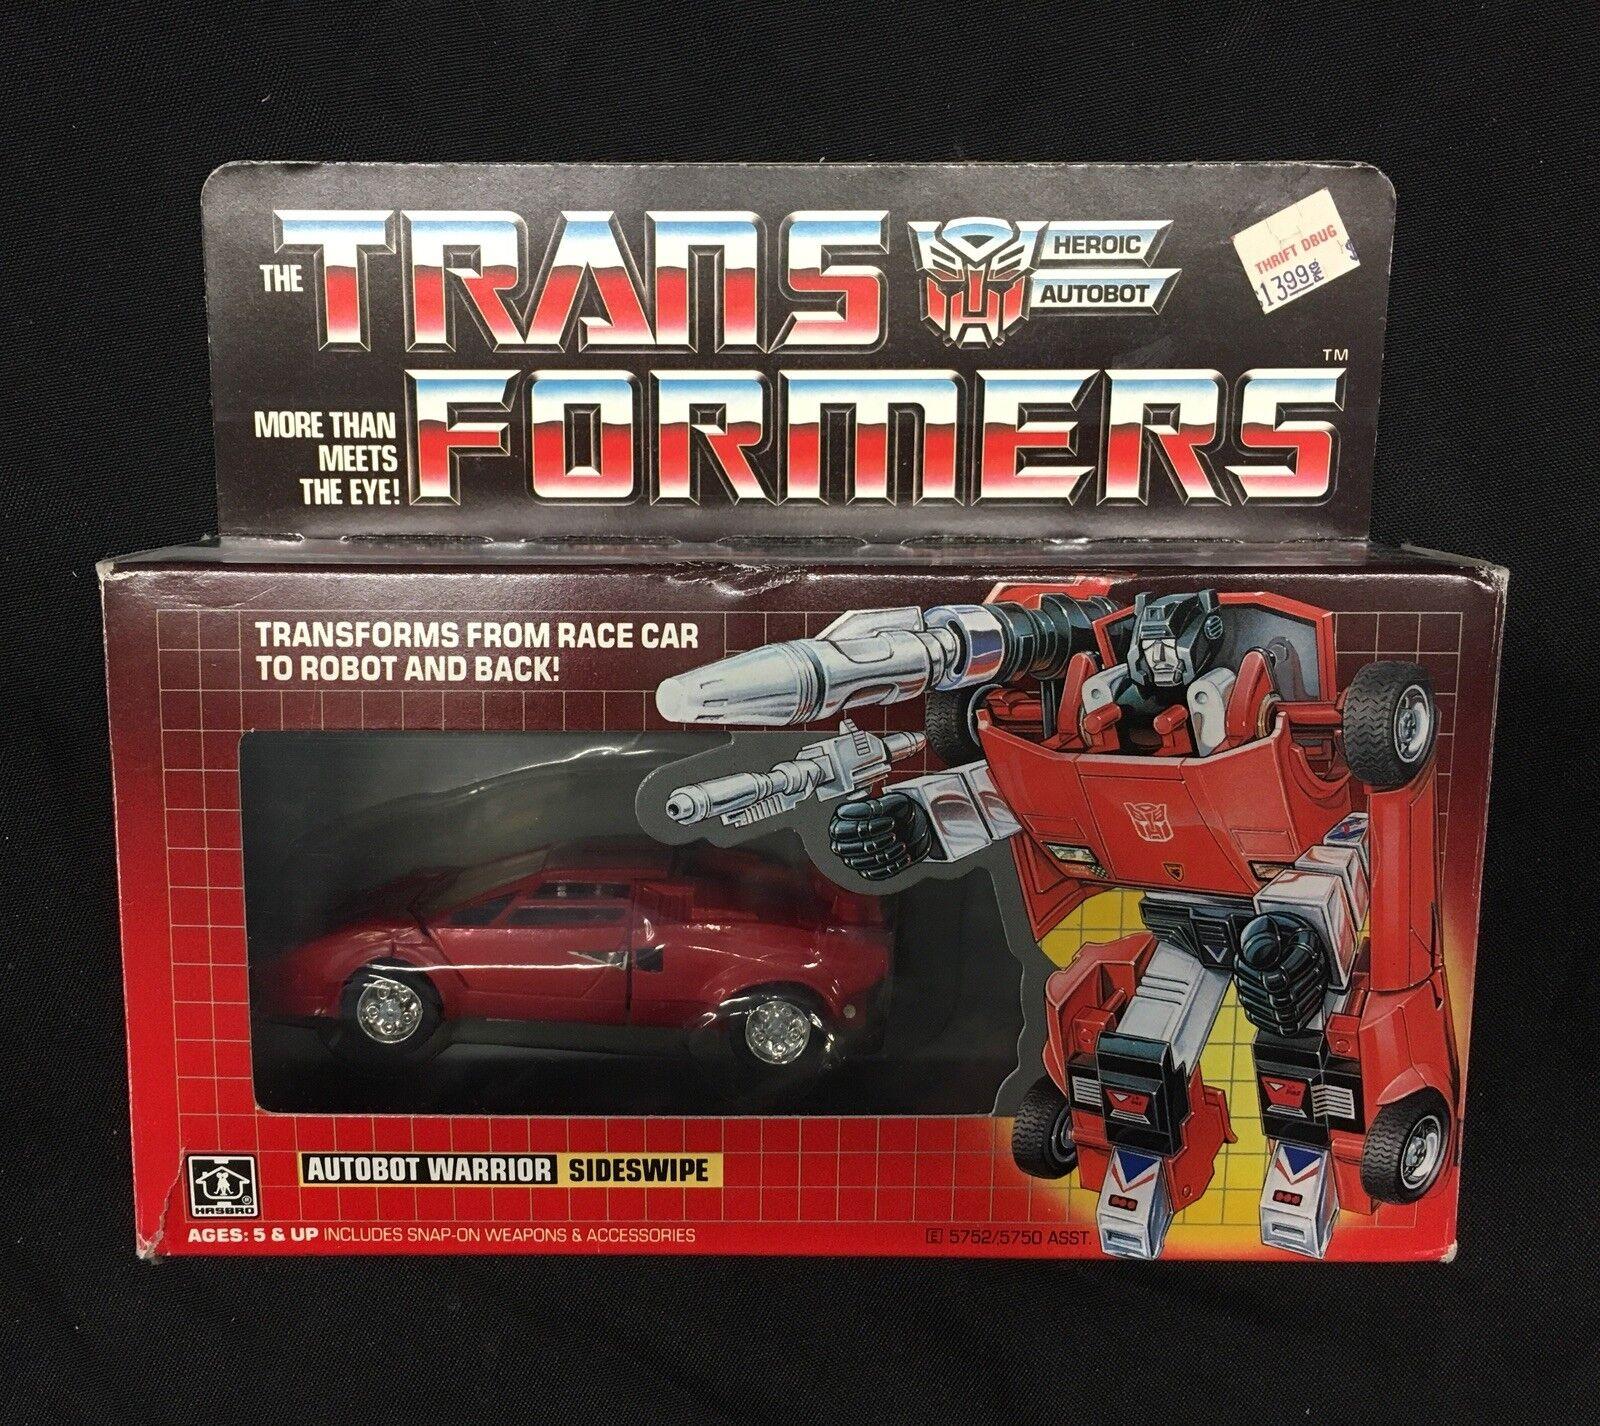 Hasbro Transformers -Carbot Warrior Sideswipe - 1984 G1 SAAH01